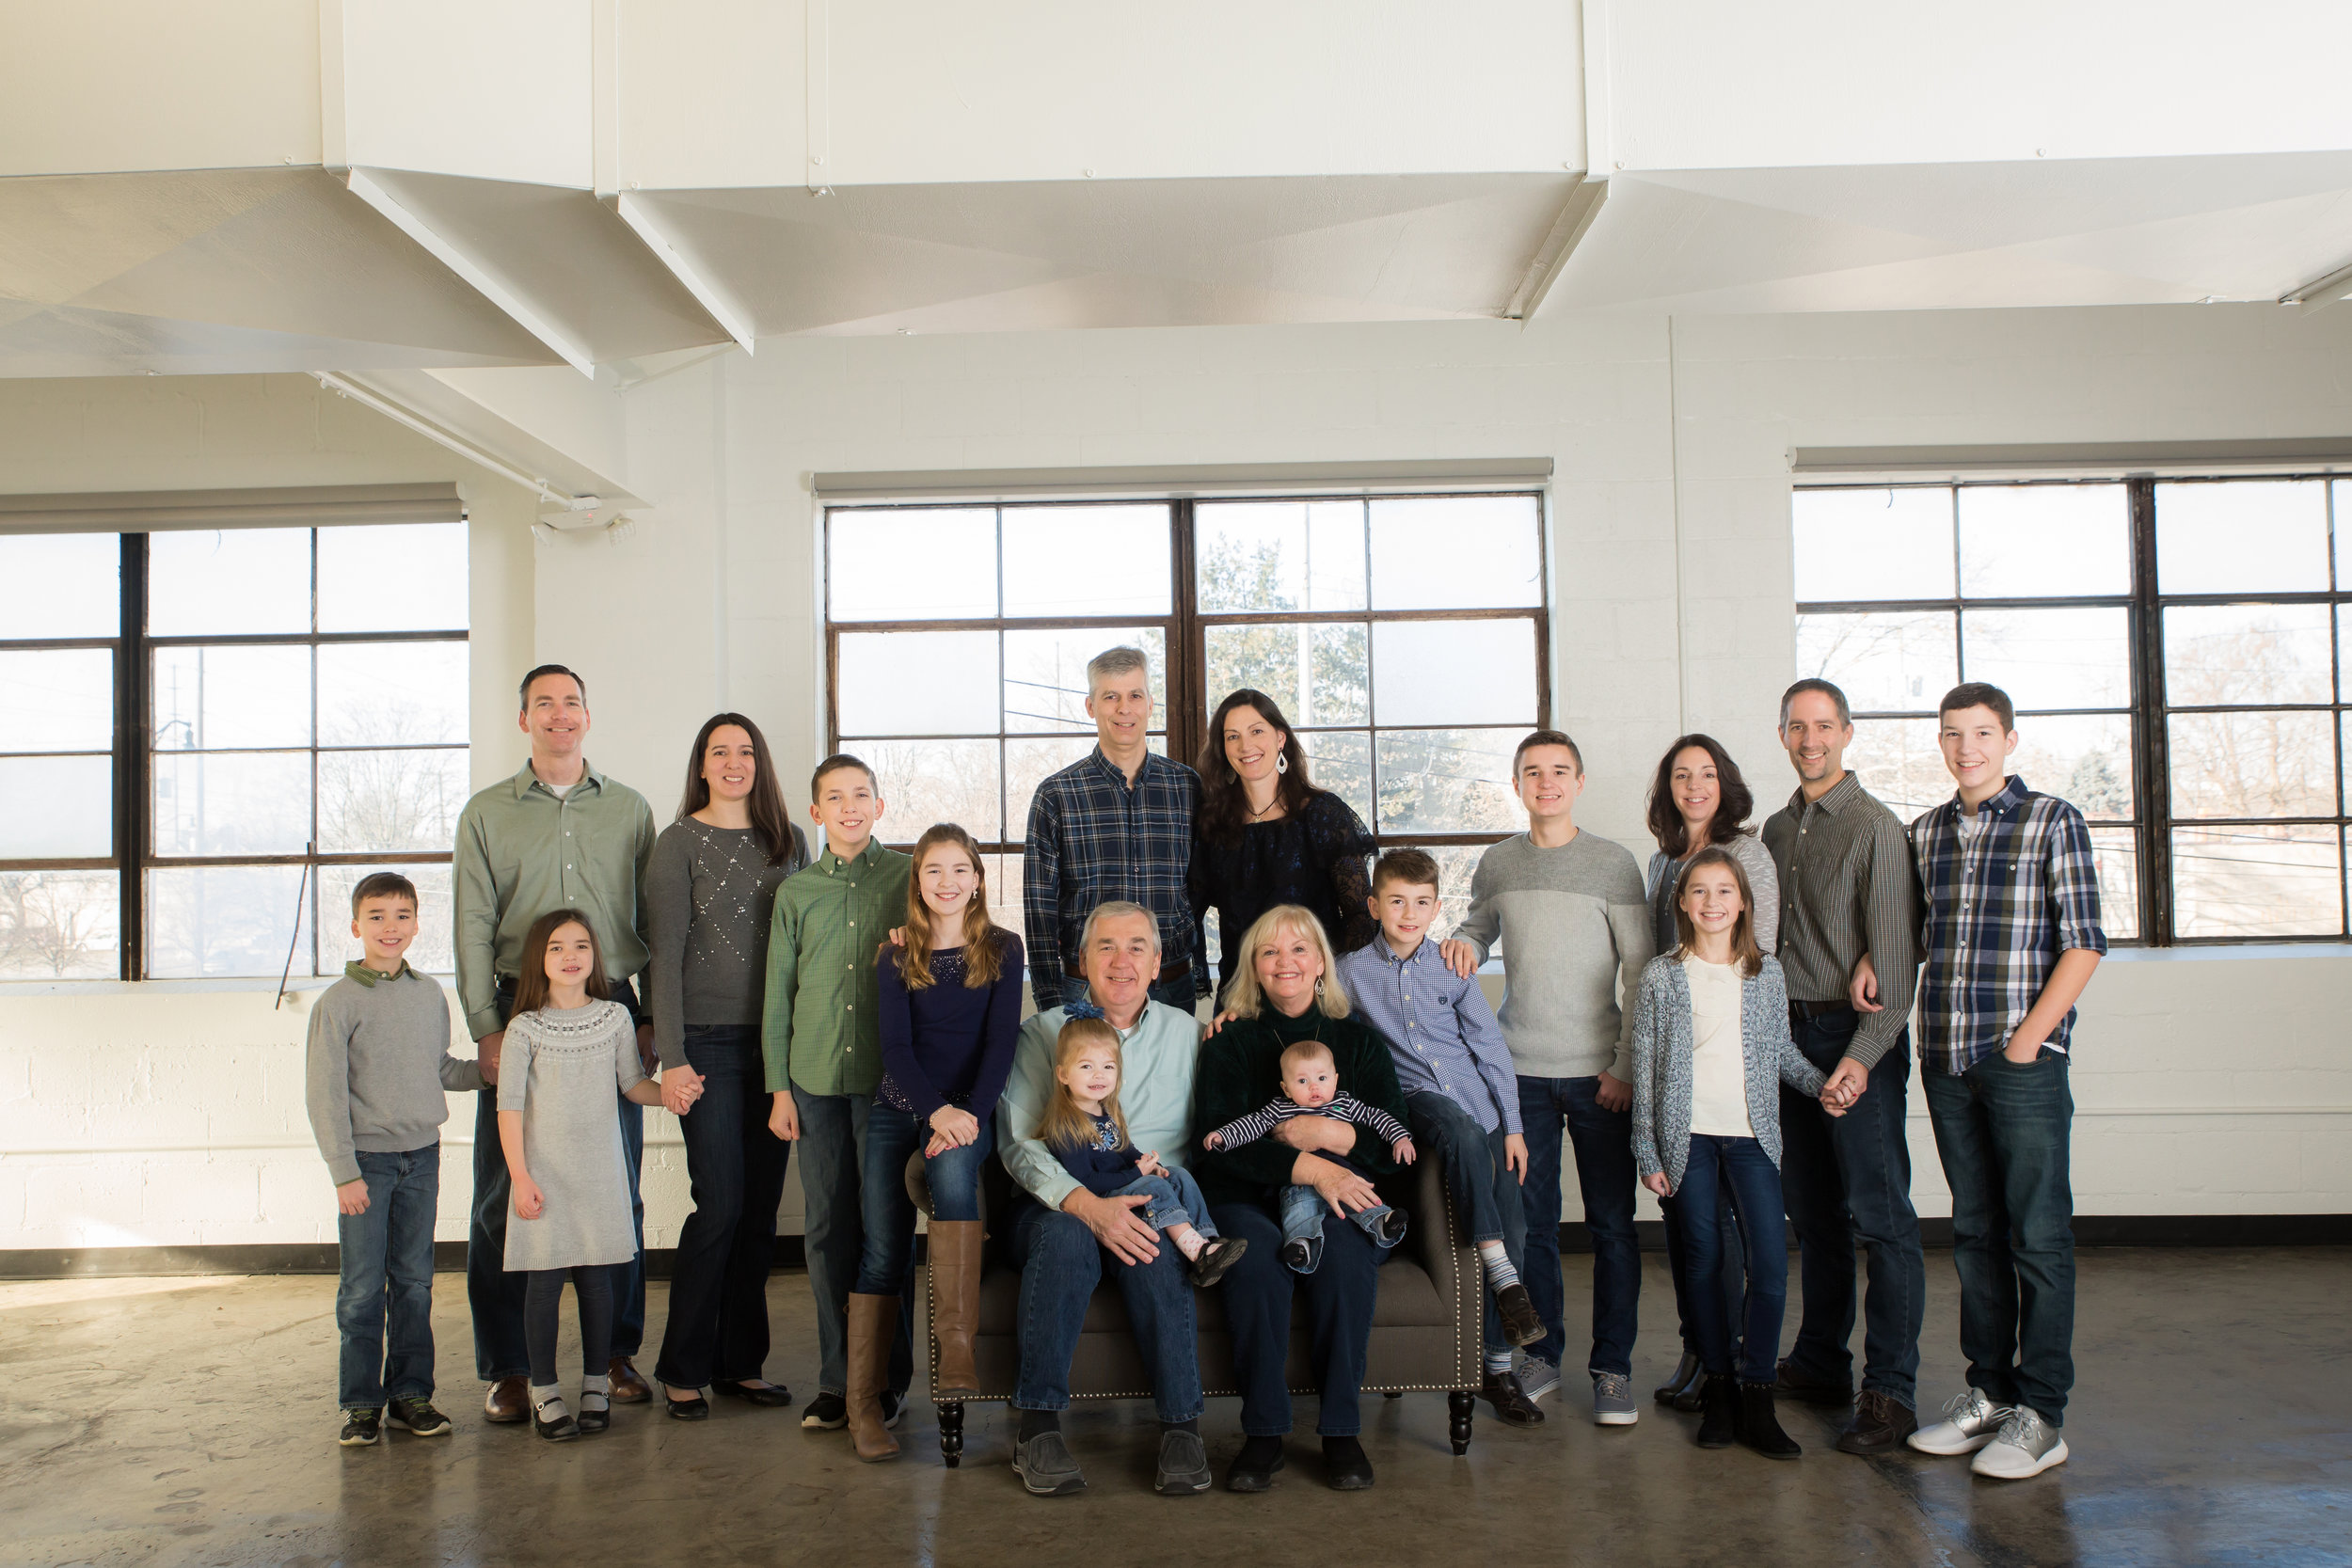 extended family photos in columbus ohio